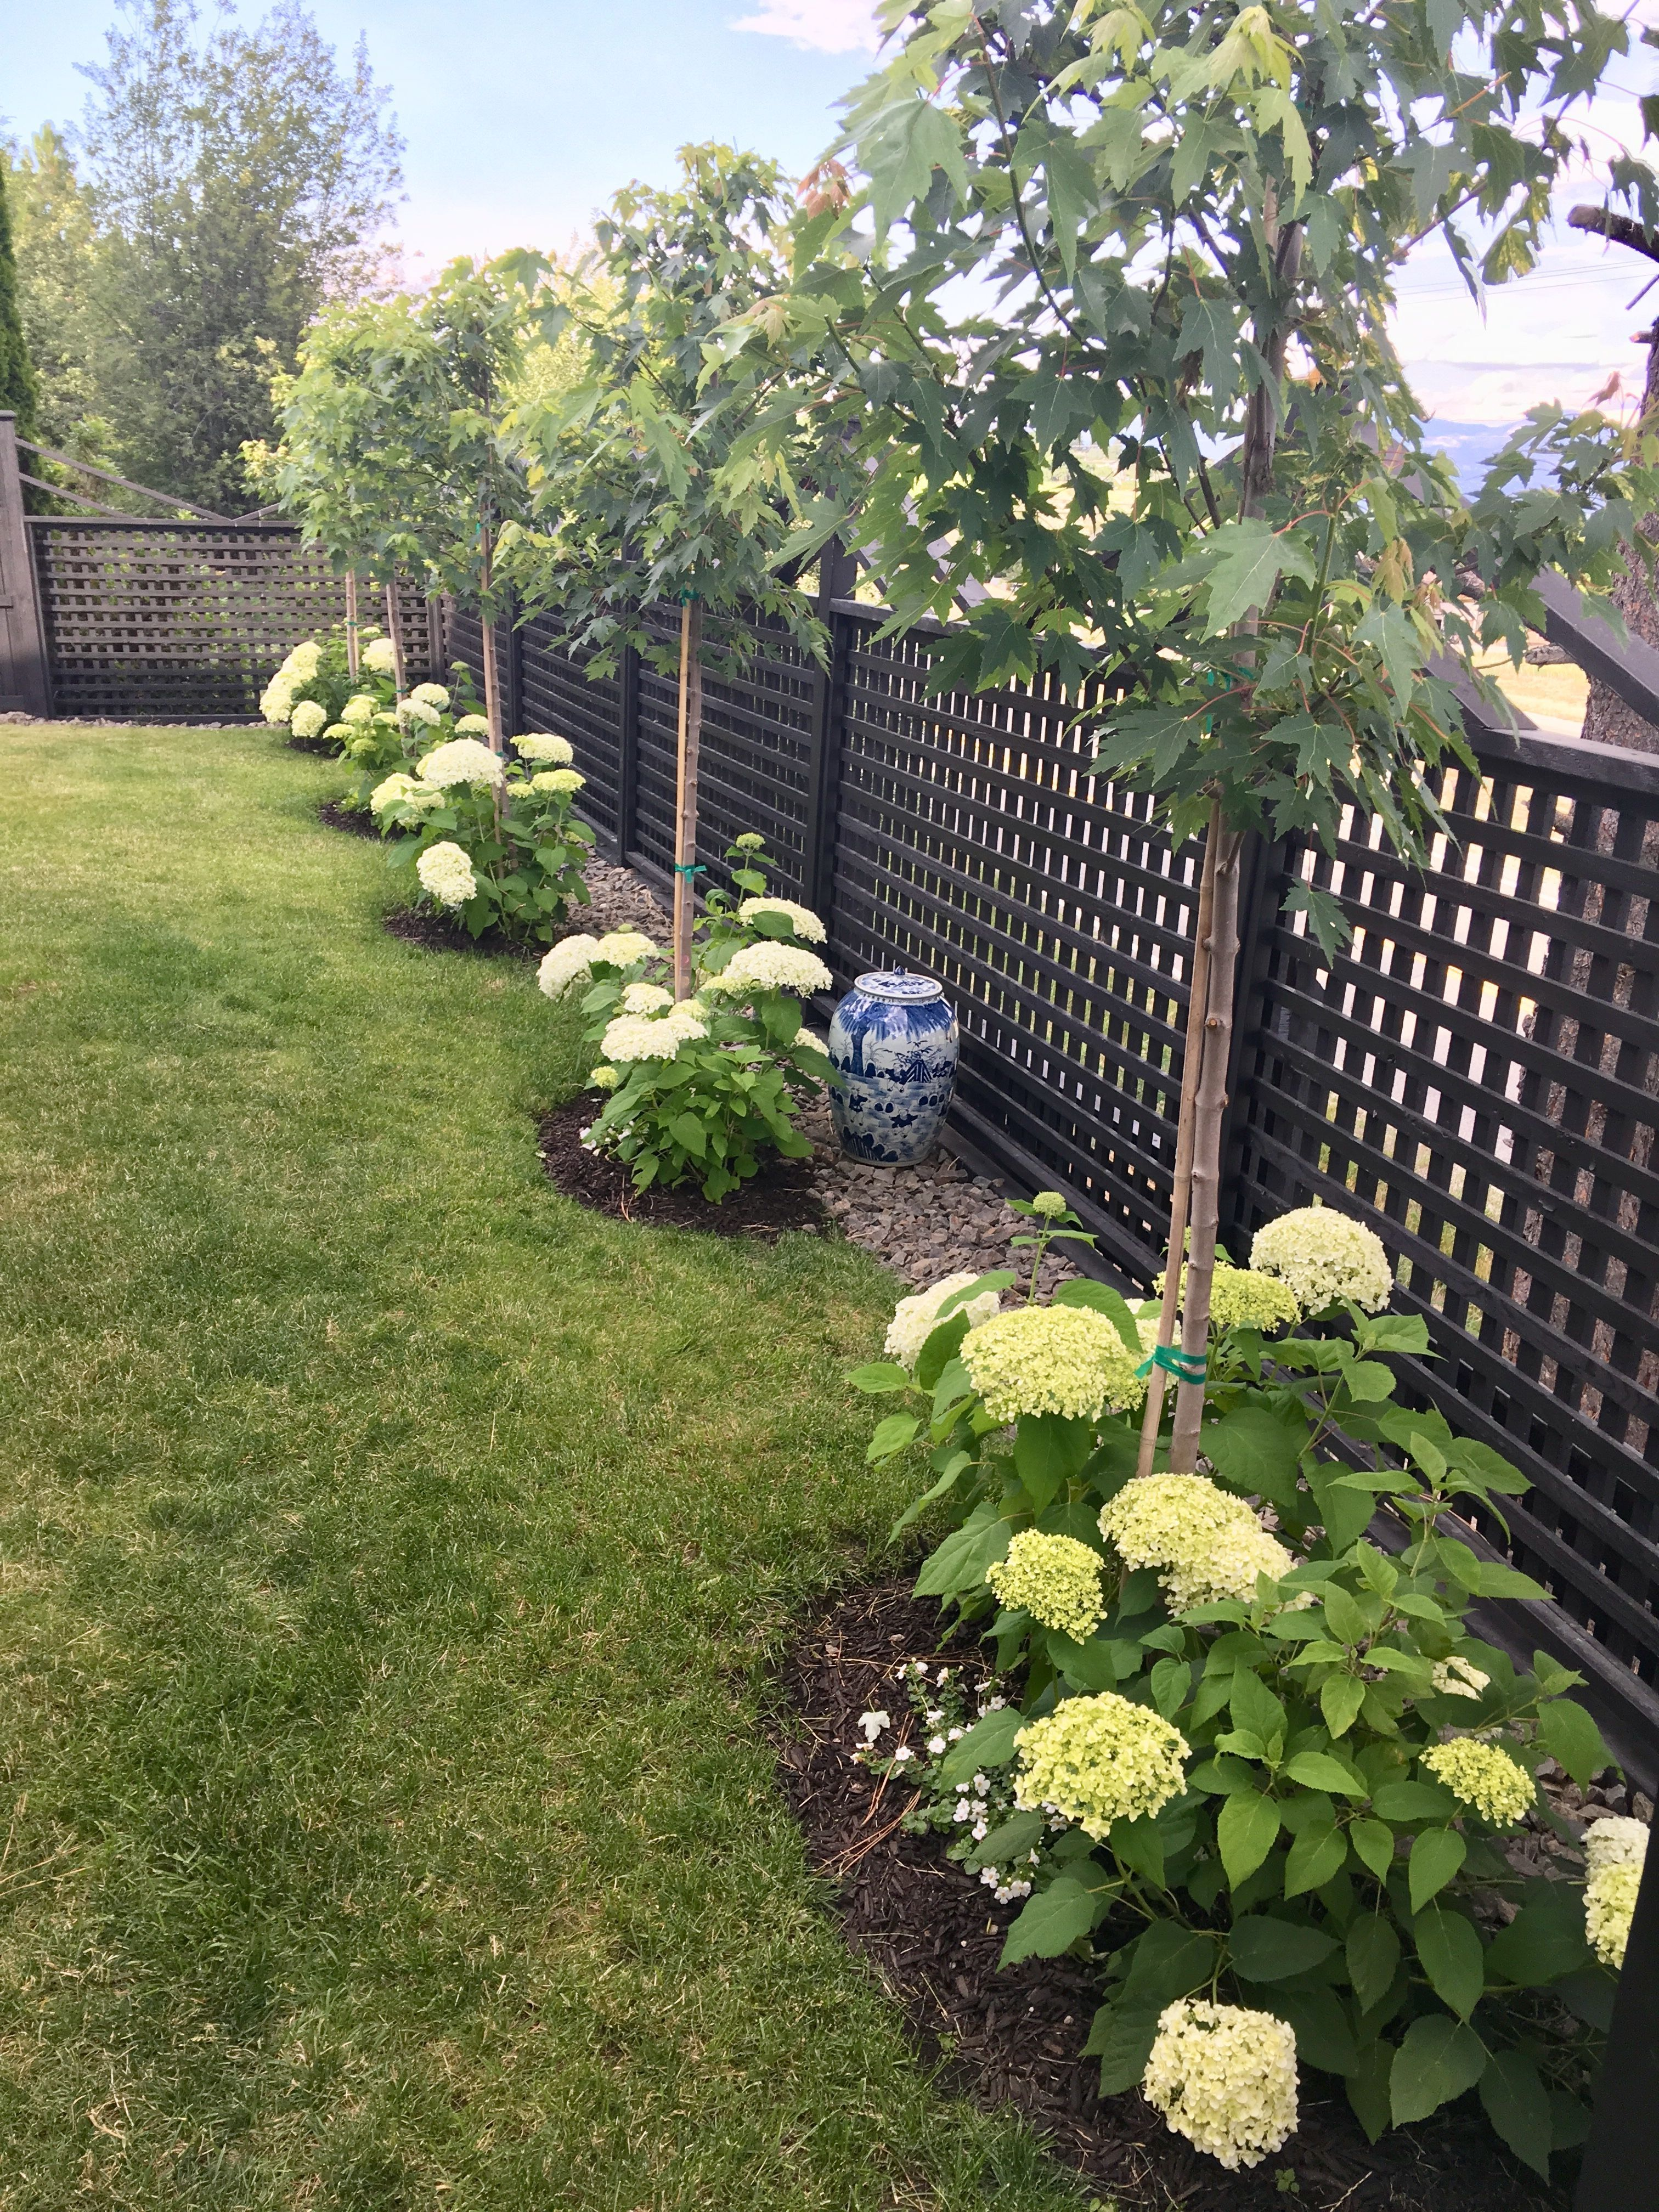 Inspiring Backyard Shed Ideas To Maximize Your Garden Space